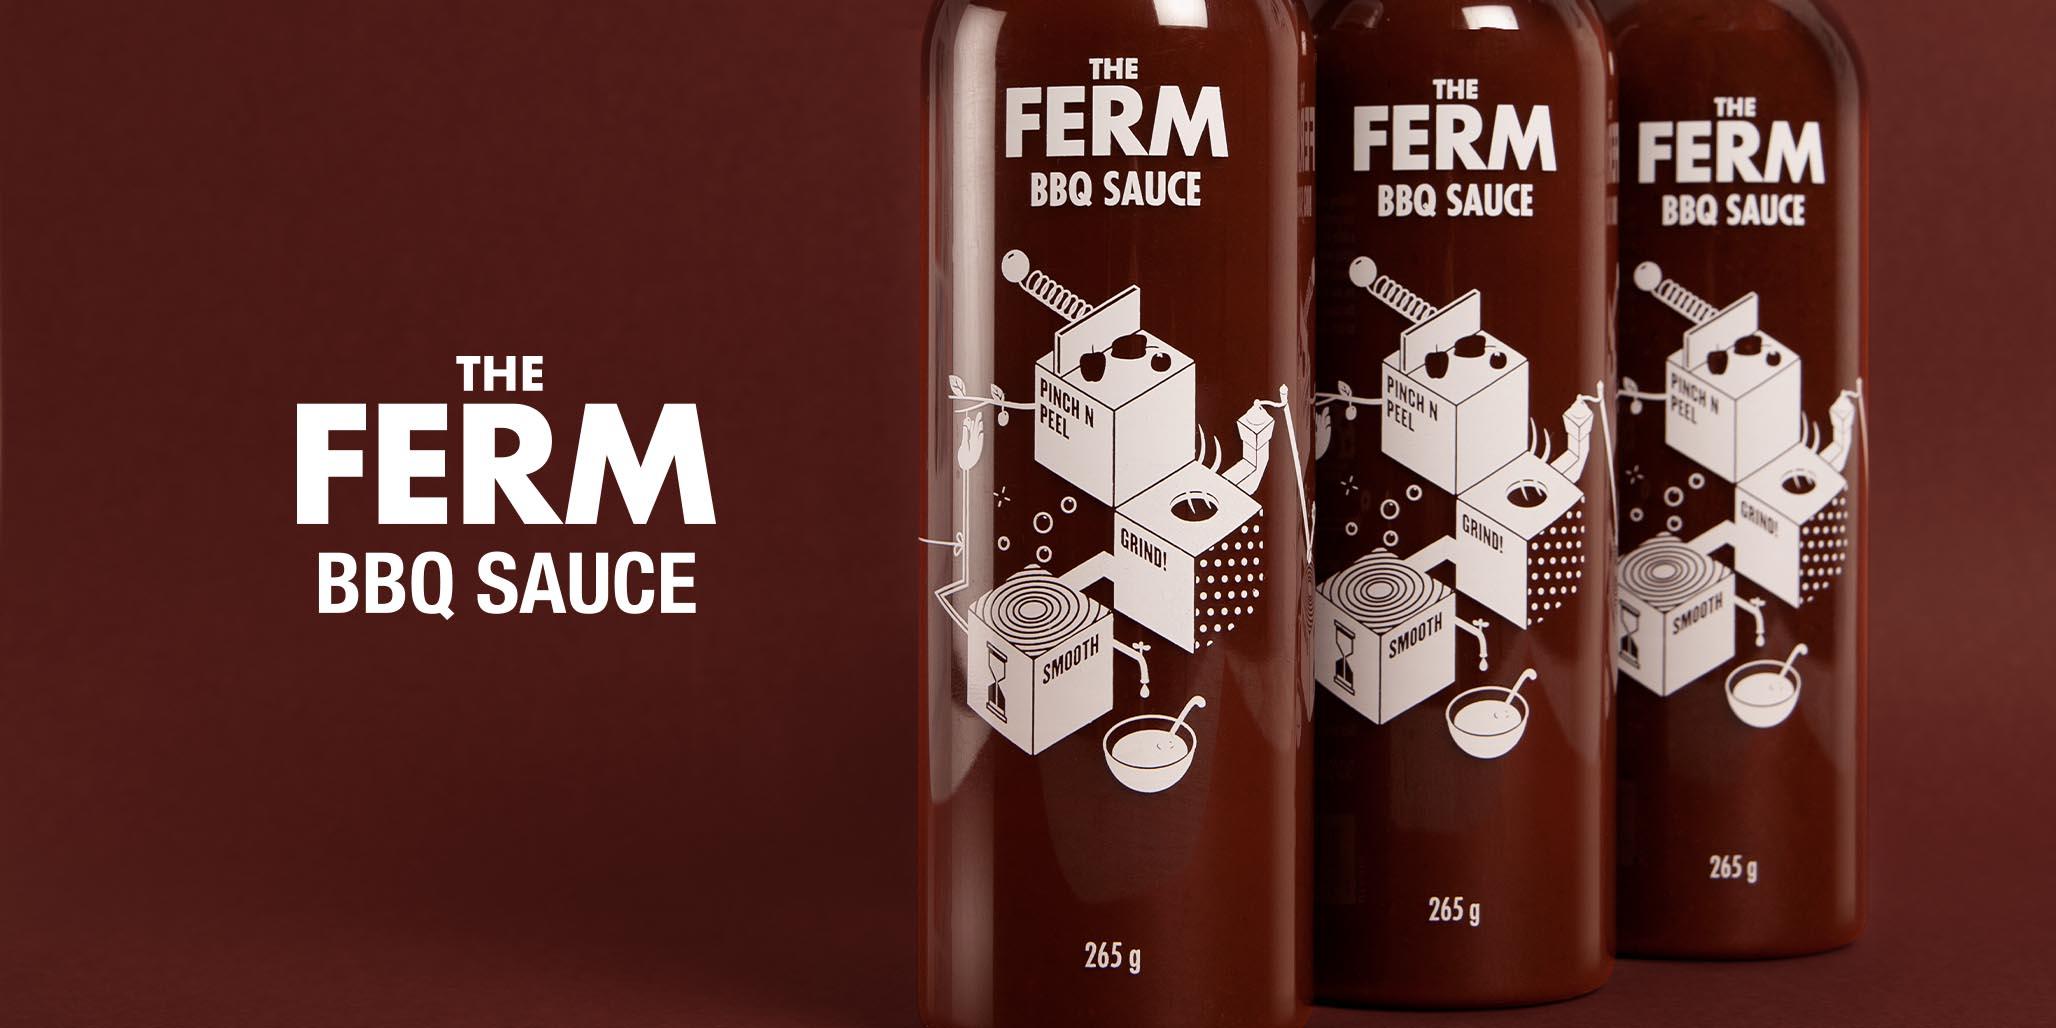 Brand Positioning, Brand Naming, Branding & Packaging Design project for FMCG food product manufacturer The Ferm, Sydney, Australia, image J